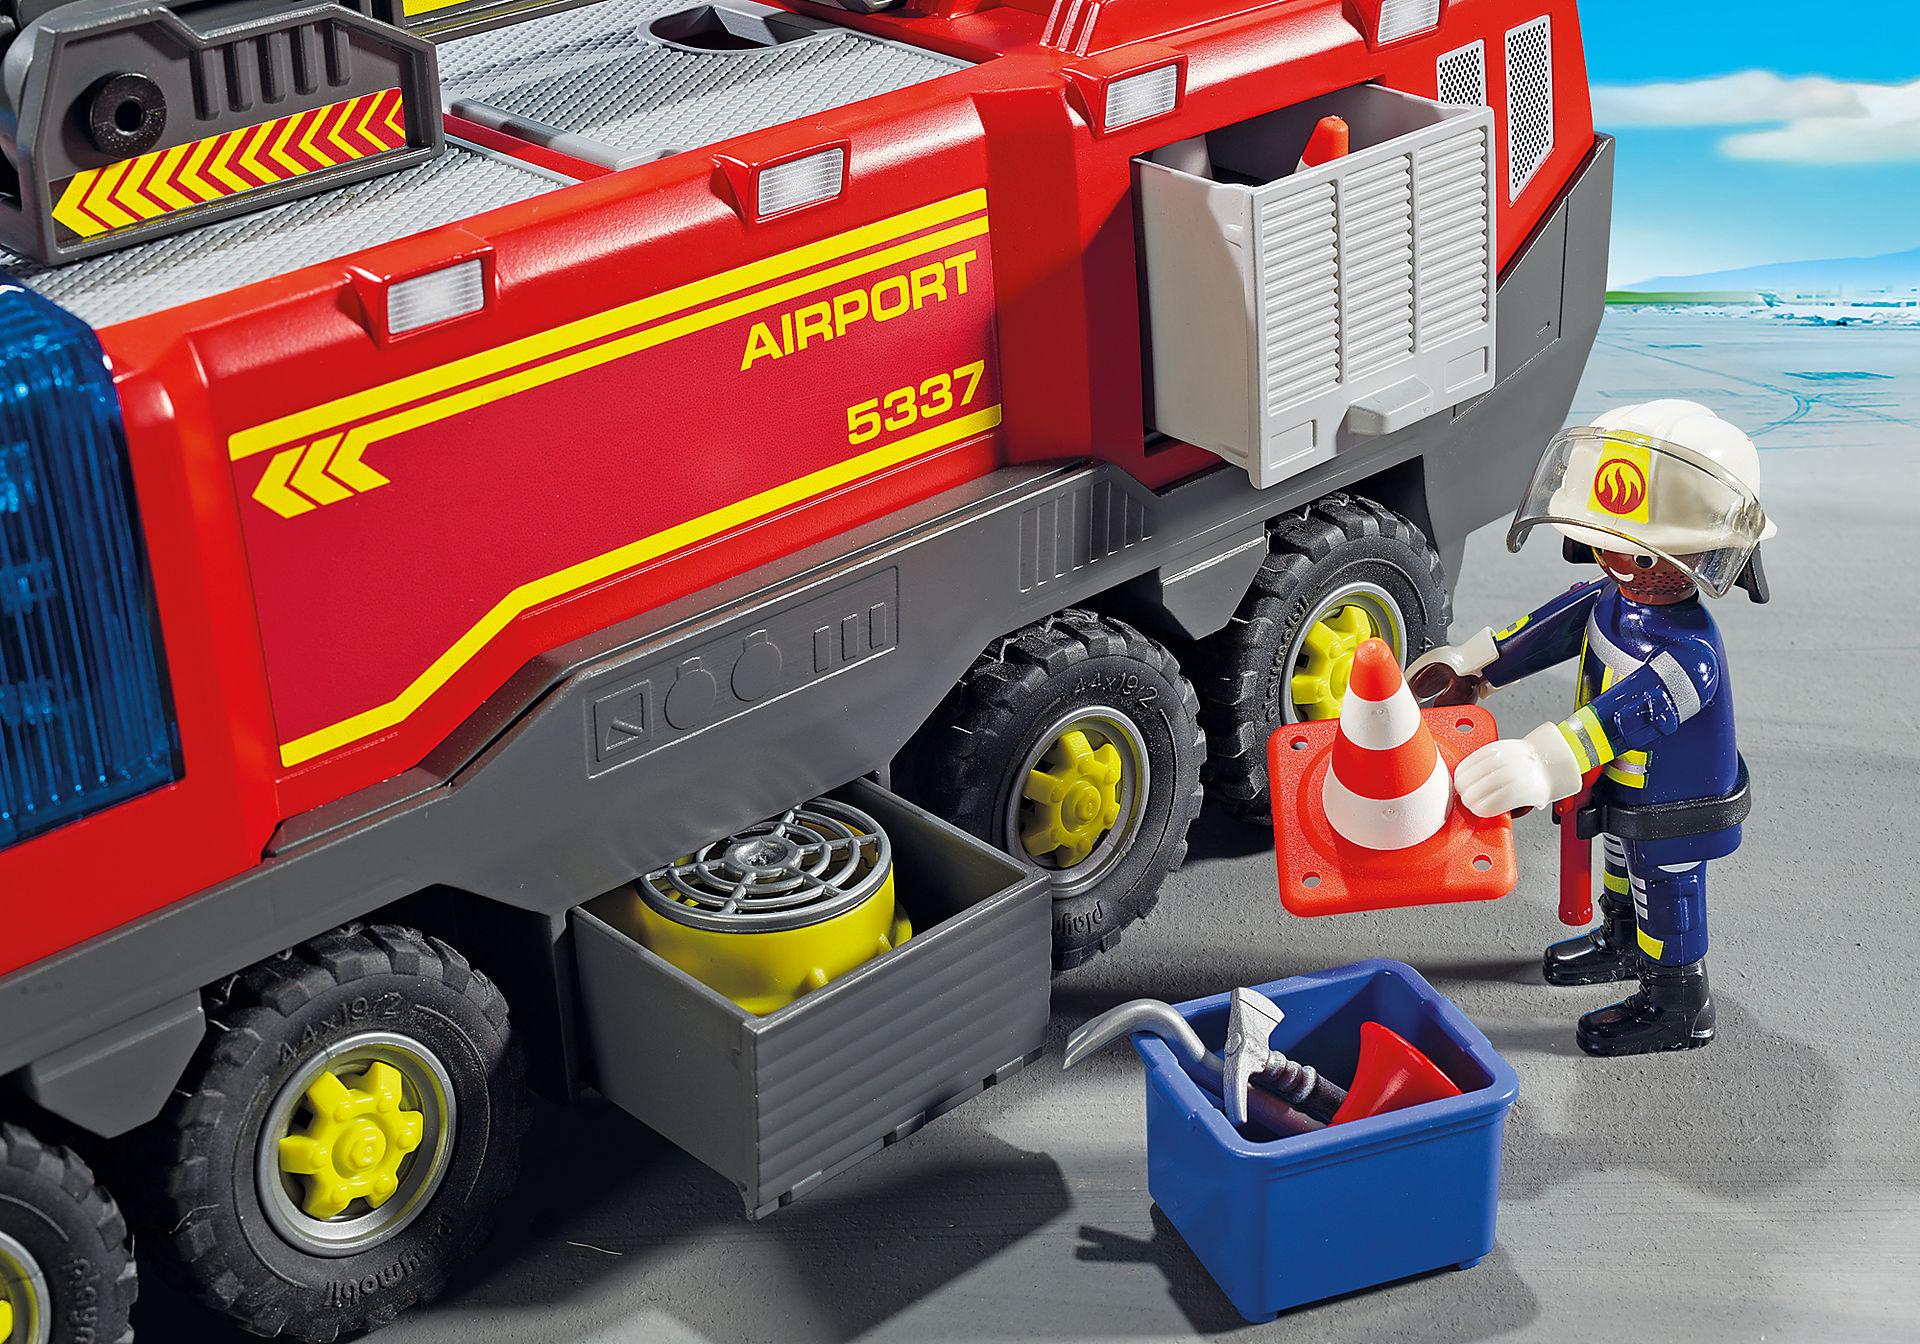 http://media.playmobil.com/i/playmobil/5337_product_extra3/Πυροσβεστικό όχημα αεροδρομίου με φώτα και ήχο